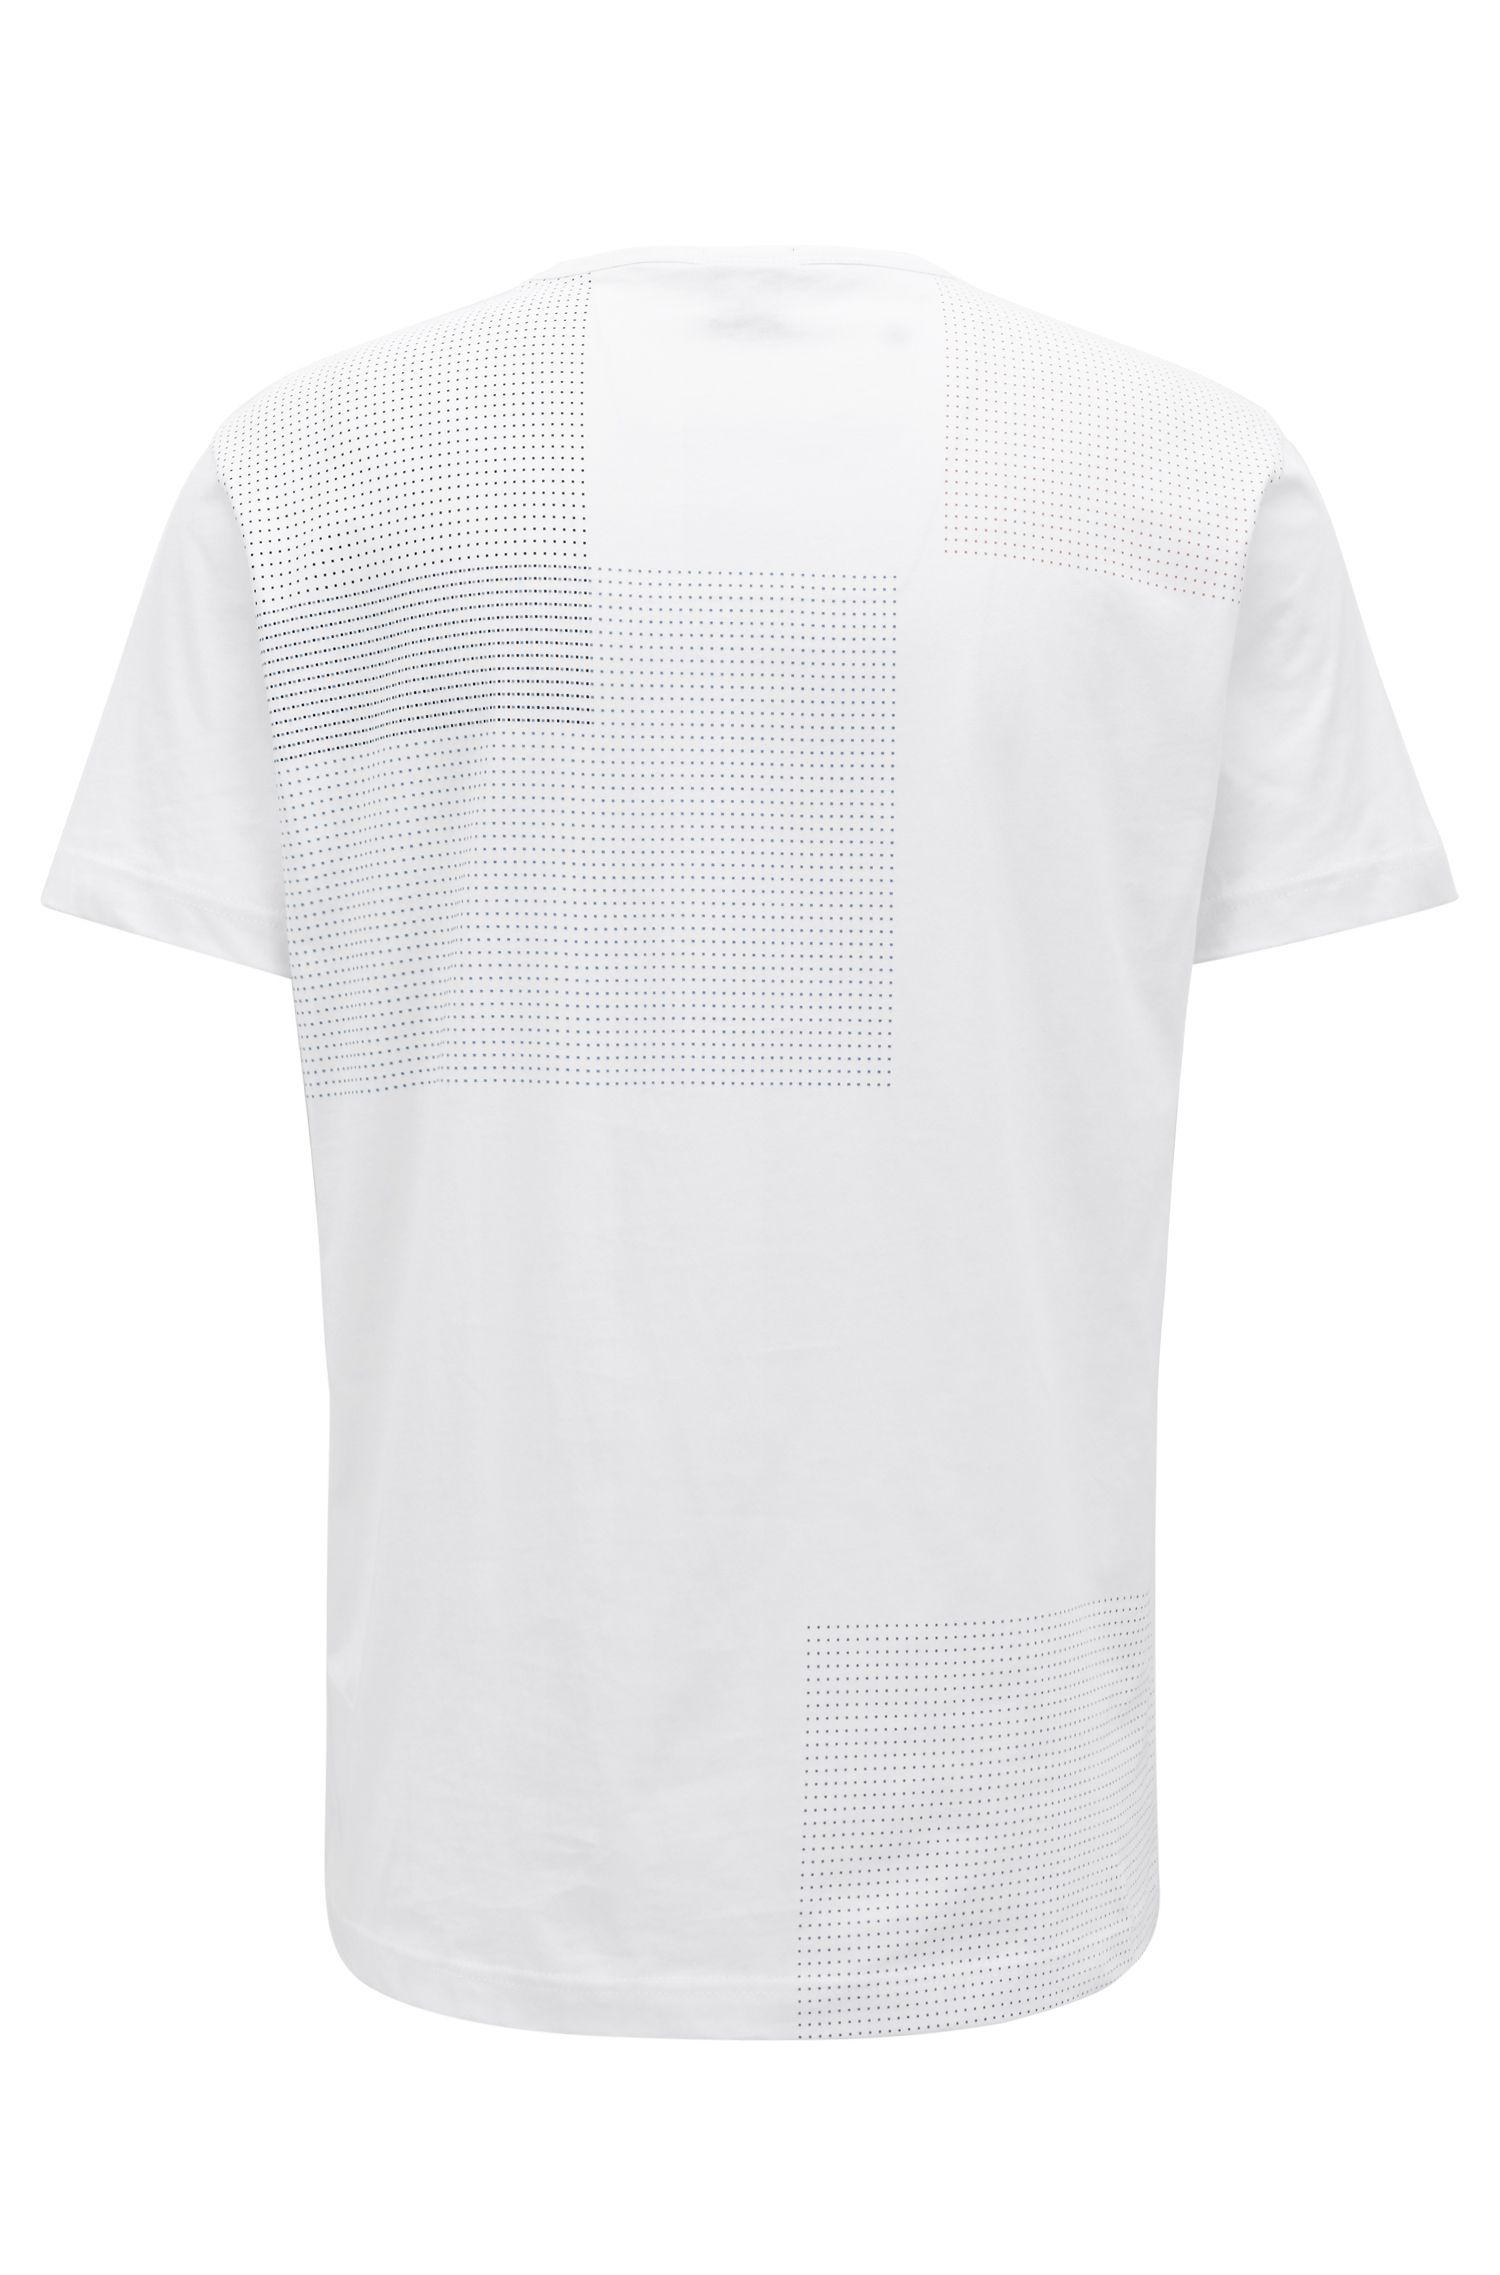 Bedrucktes T-Shirt aus Single Jersey mit Logo